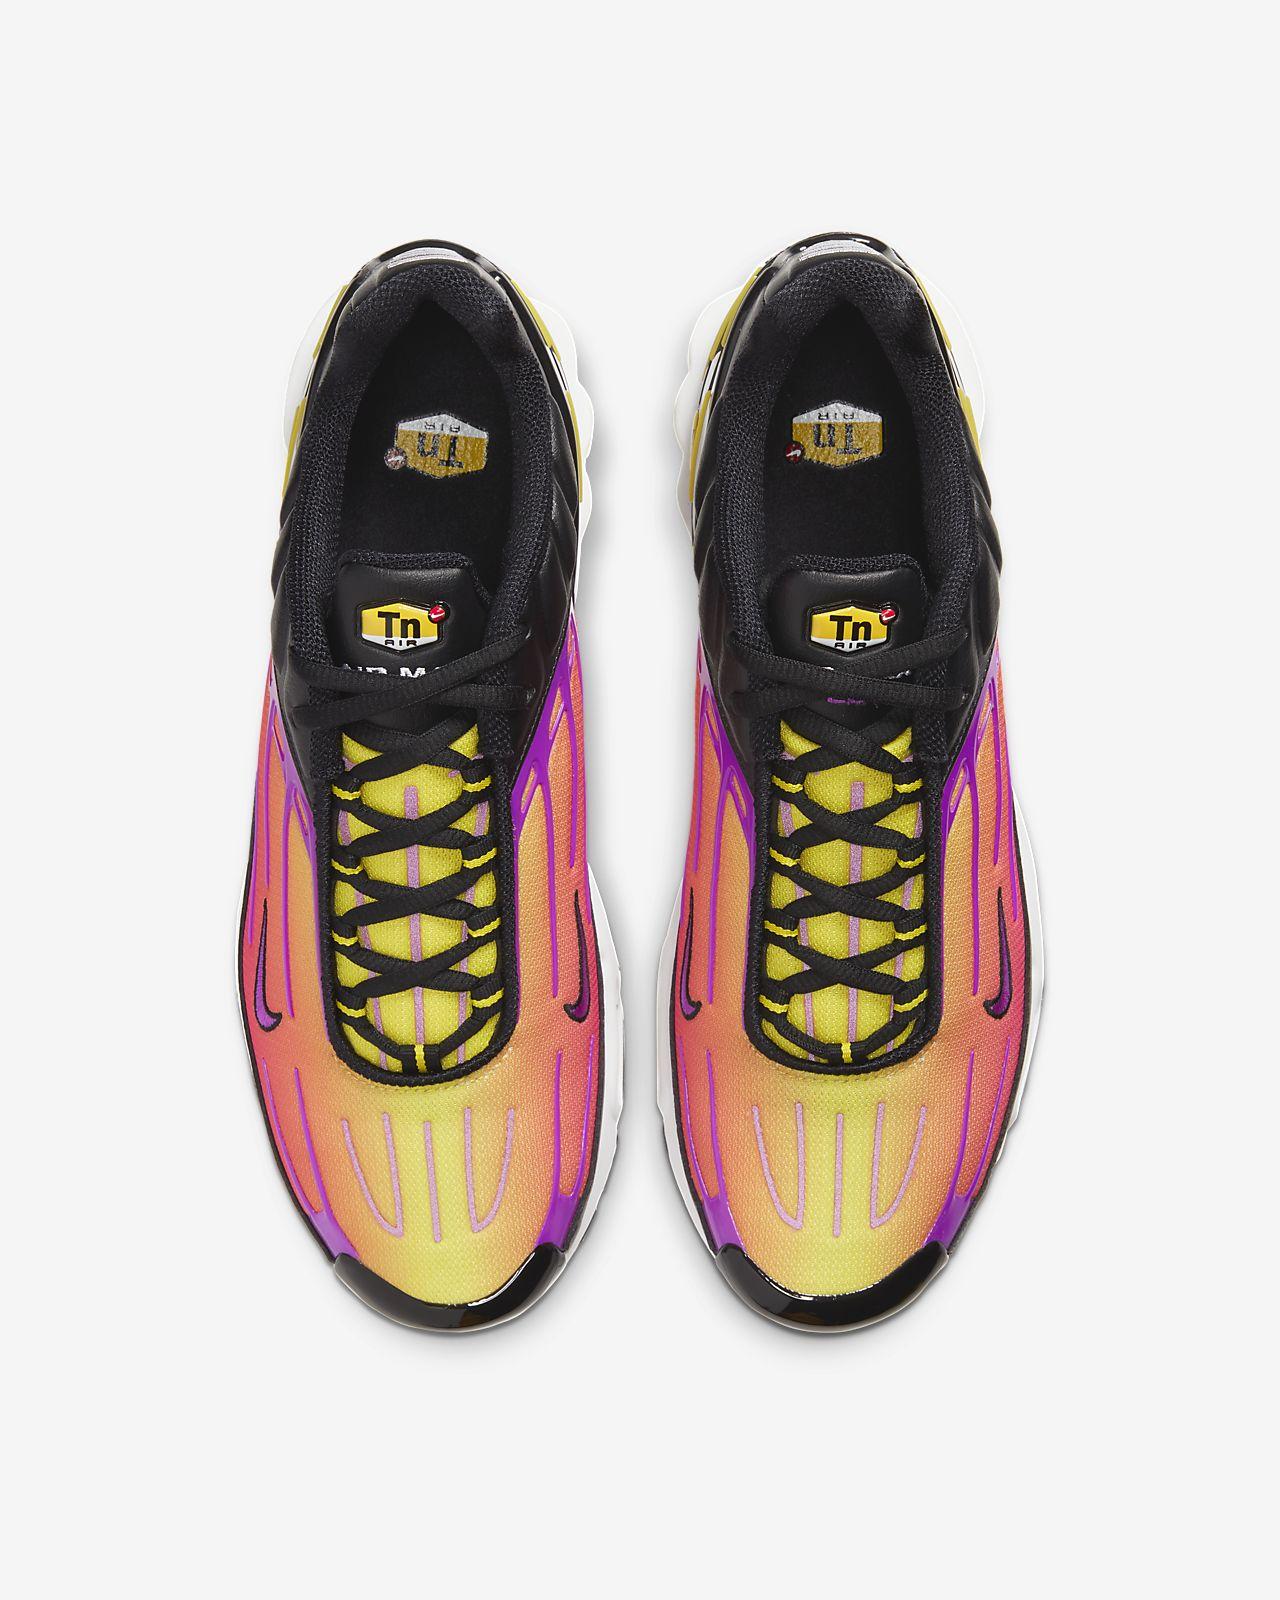 Sapatilhas Nike Air Max Plus III para homem